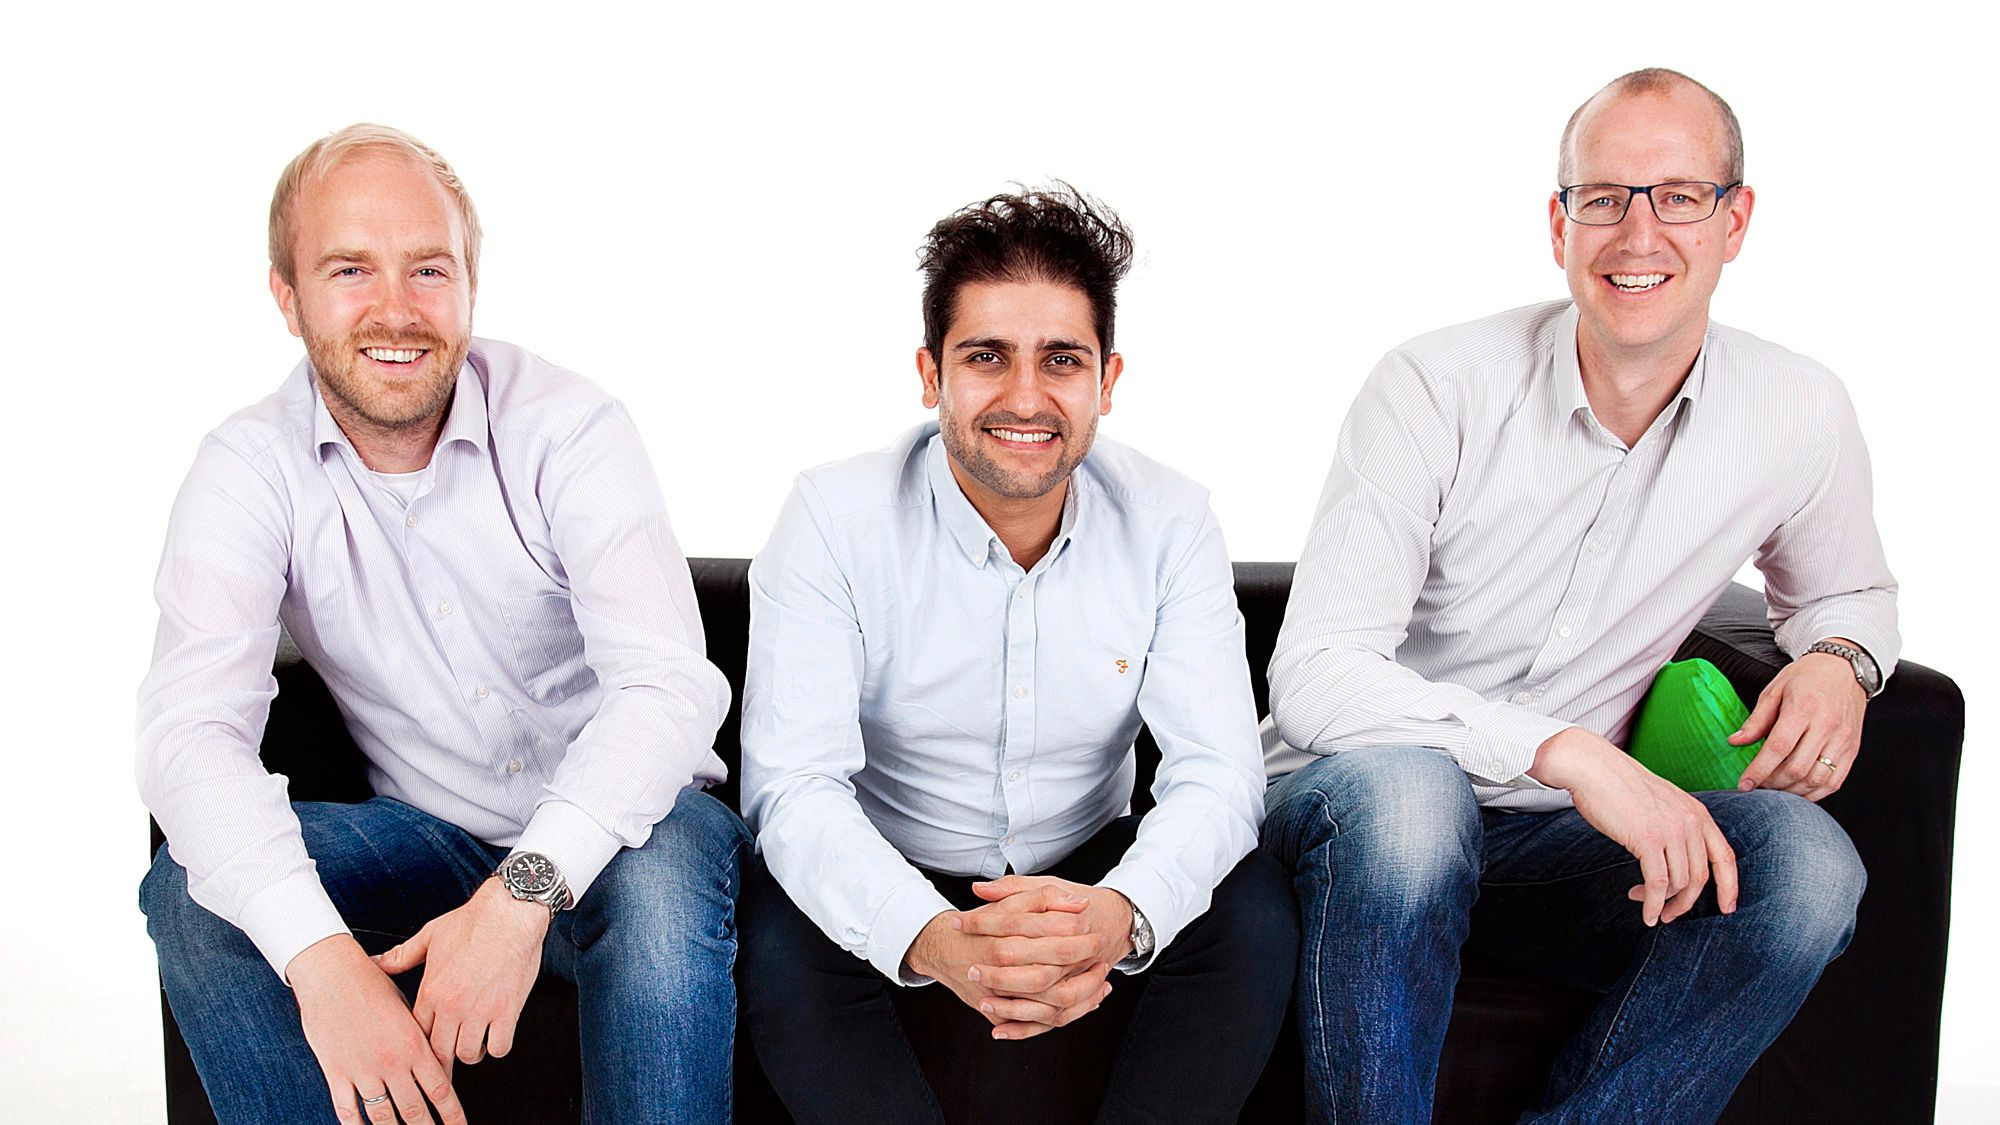 SOCOs gründere. Fra venstre Kenneth Stensrud Olsen, Keyhan Farahaninia og Marius Mæle.Foto: SOCO